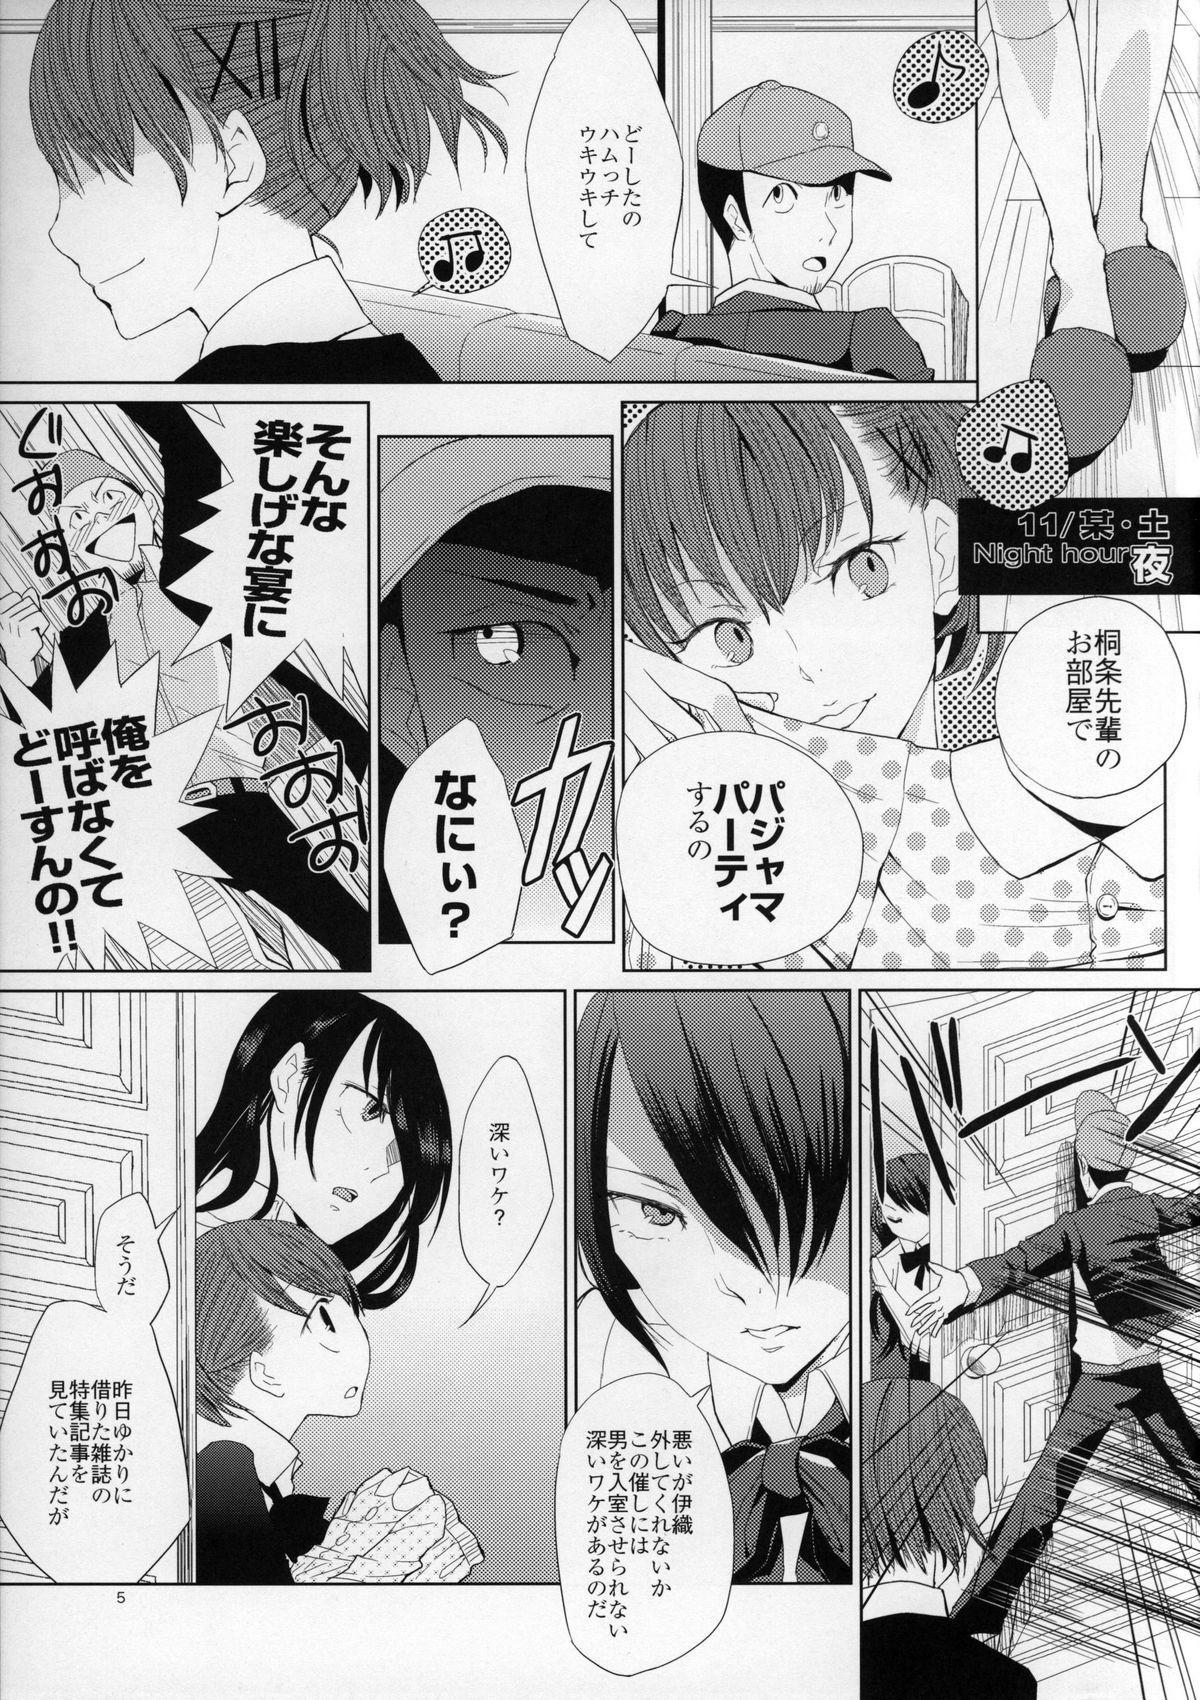 YURI SONA 2 Yoru no Joou - Midnight Queen 3